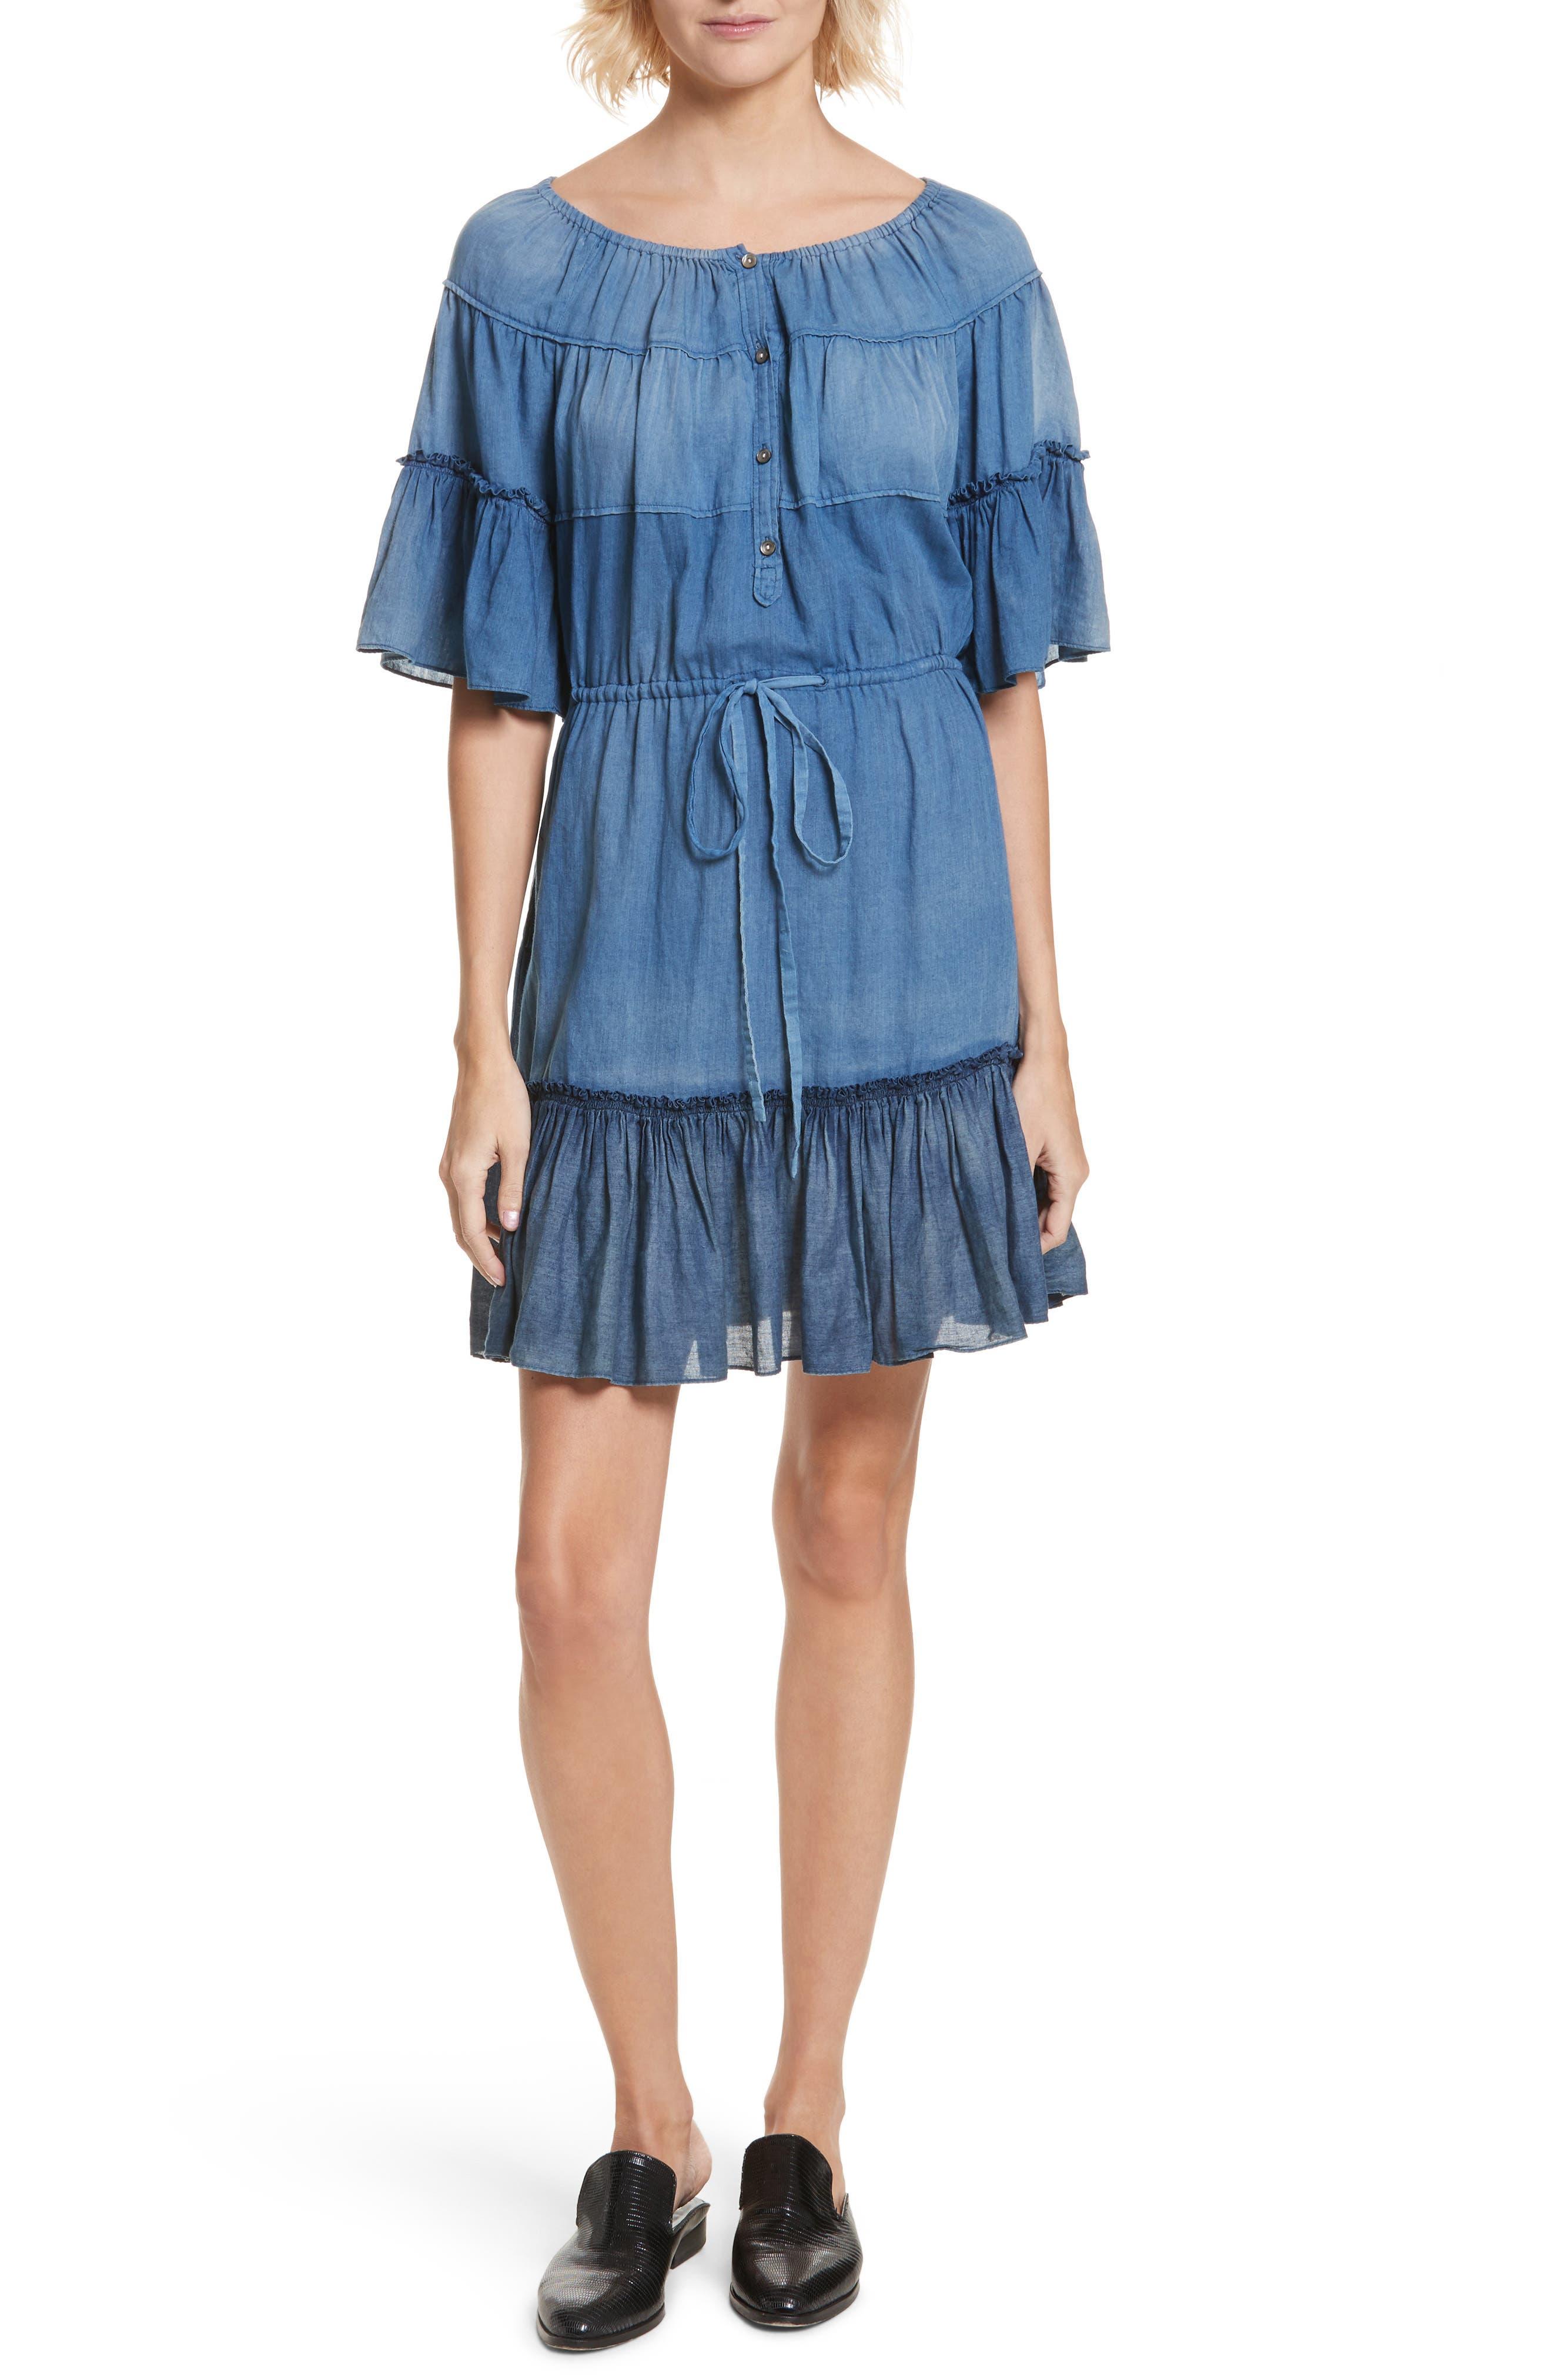 Alternate Image 1 Selected - La Vie Rebecca Taylor Ruffle Tissue Denim Dress